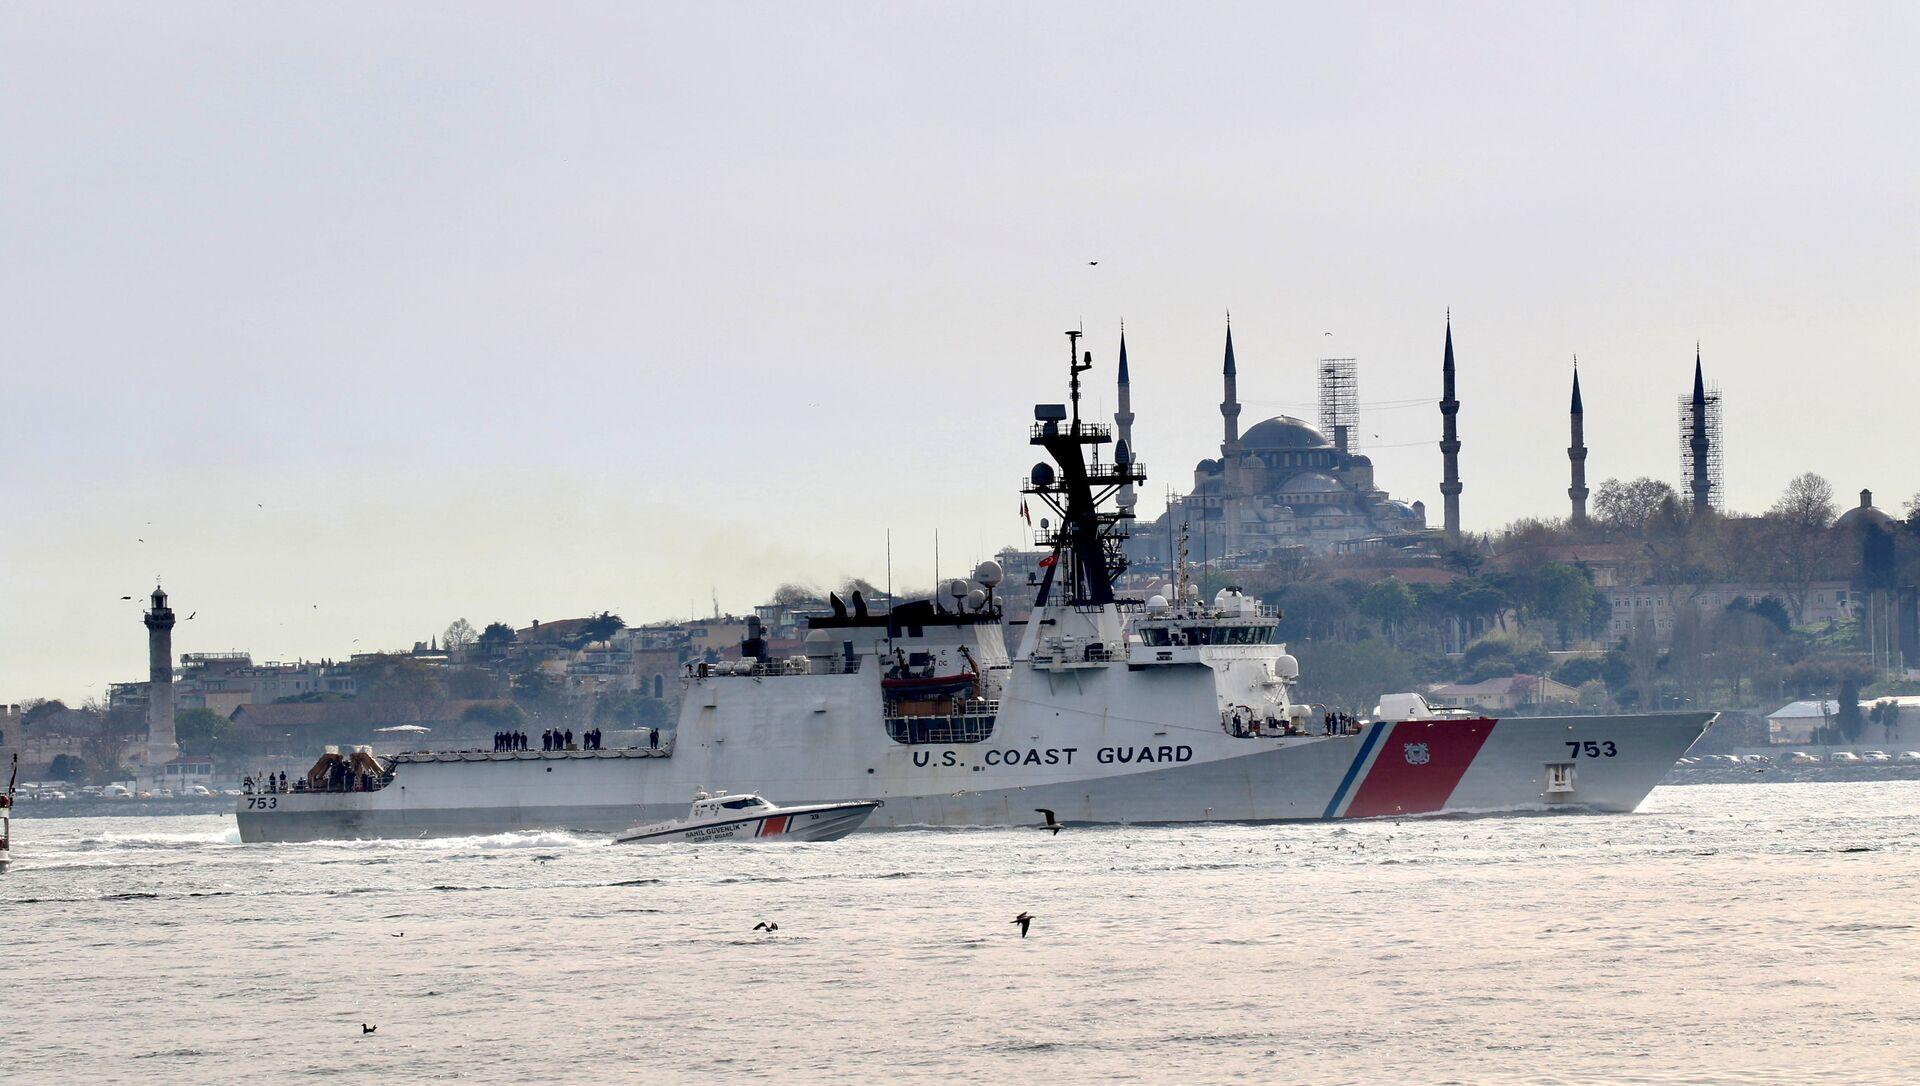 U.S. Coast Guard Legend-class national security cutter USCGC Hamilton (WMSL 753) sets sail in the Bosphorus, on its way to the Black Sea, in Istanbul, Turkey April 27, 2021. - Sputnik International, 1920, 02.08.2021